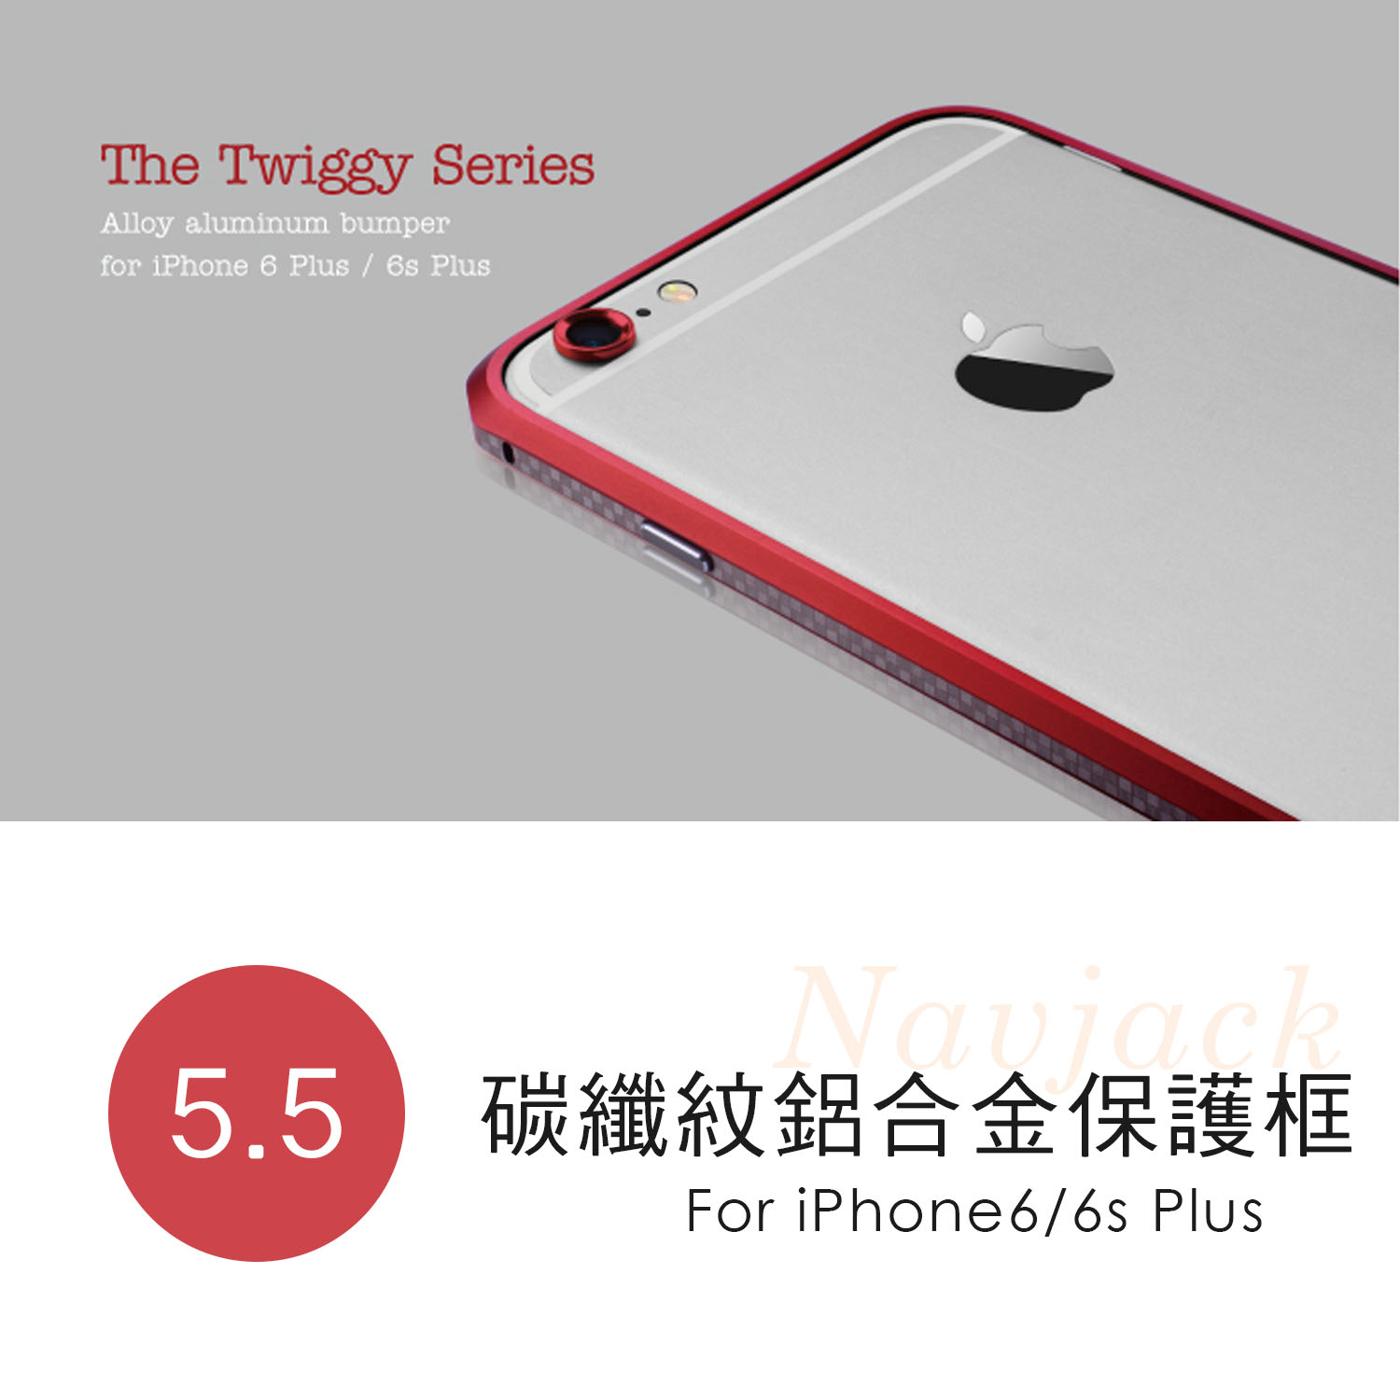 Navjack iPhone6s Plus Twiggy 碳纖紋鋁合金保護框 【C-I6-P22】 5.5 金屬邊框 玫瑰金